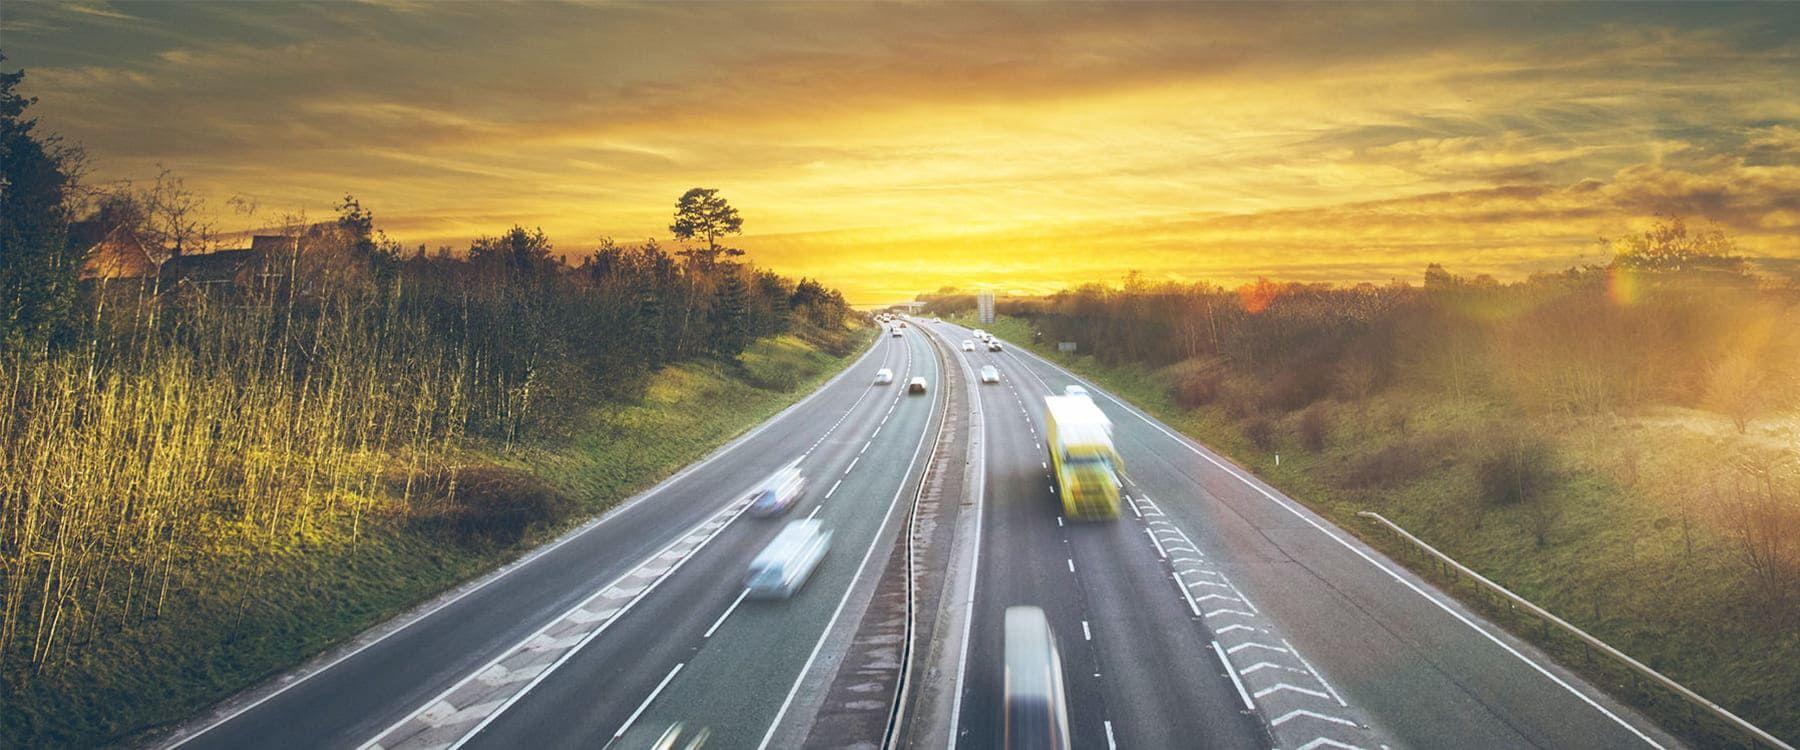 Transport planning software